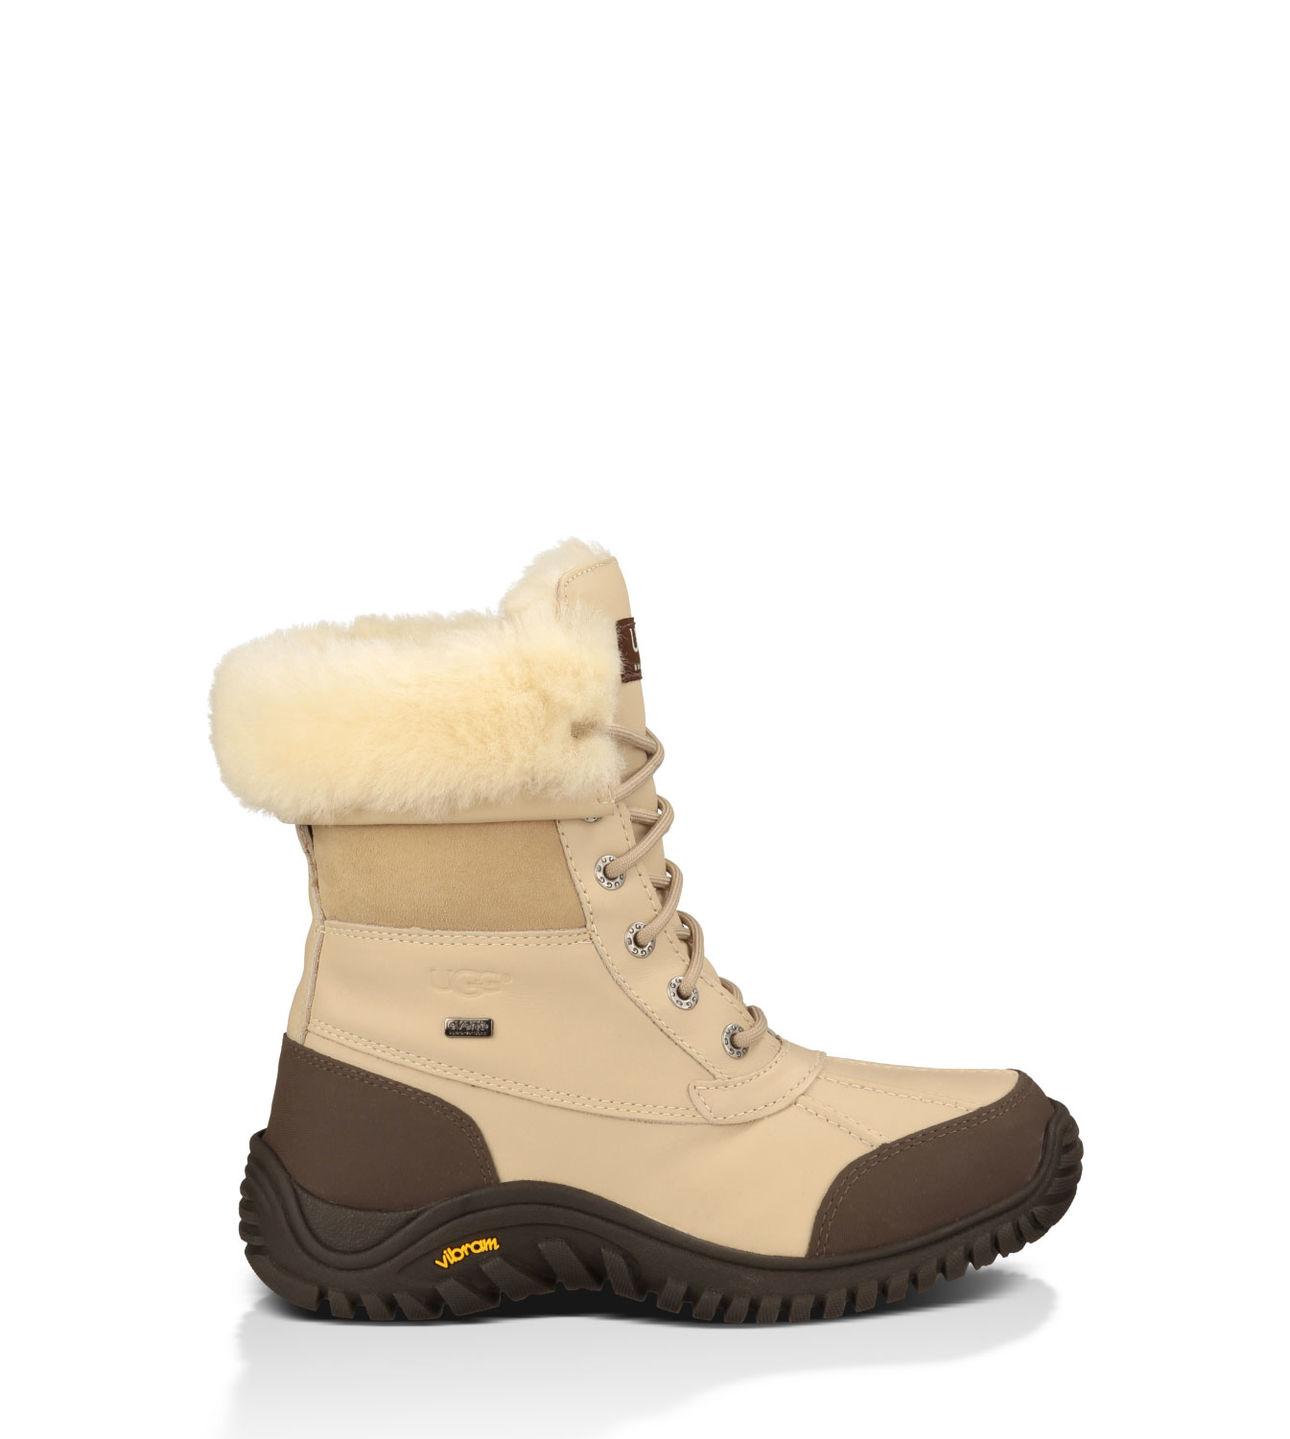 33767c8d20399 Ugg Australia Adirondack Boot II vs Sorel Joan of Arctic Boot ...